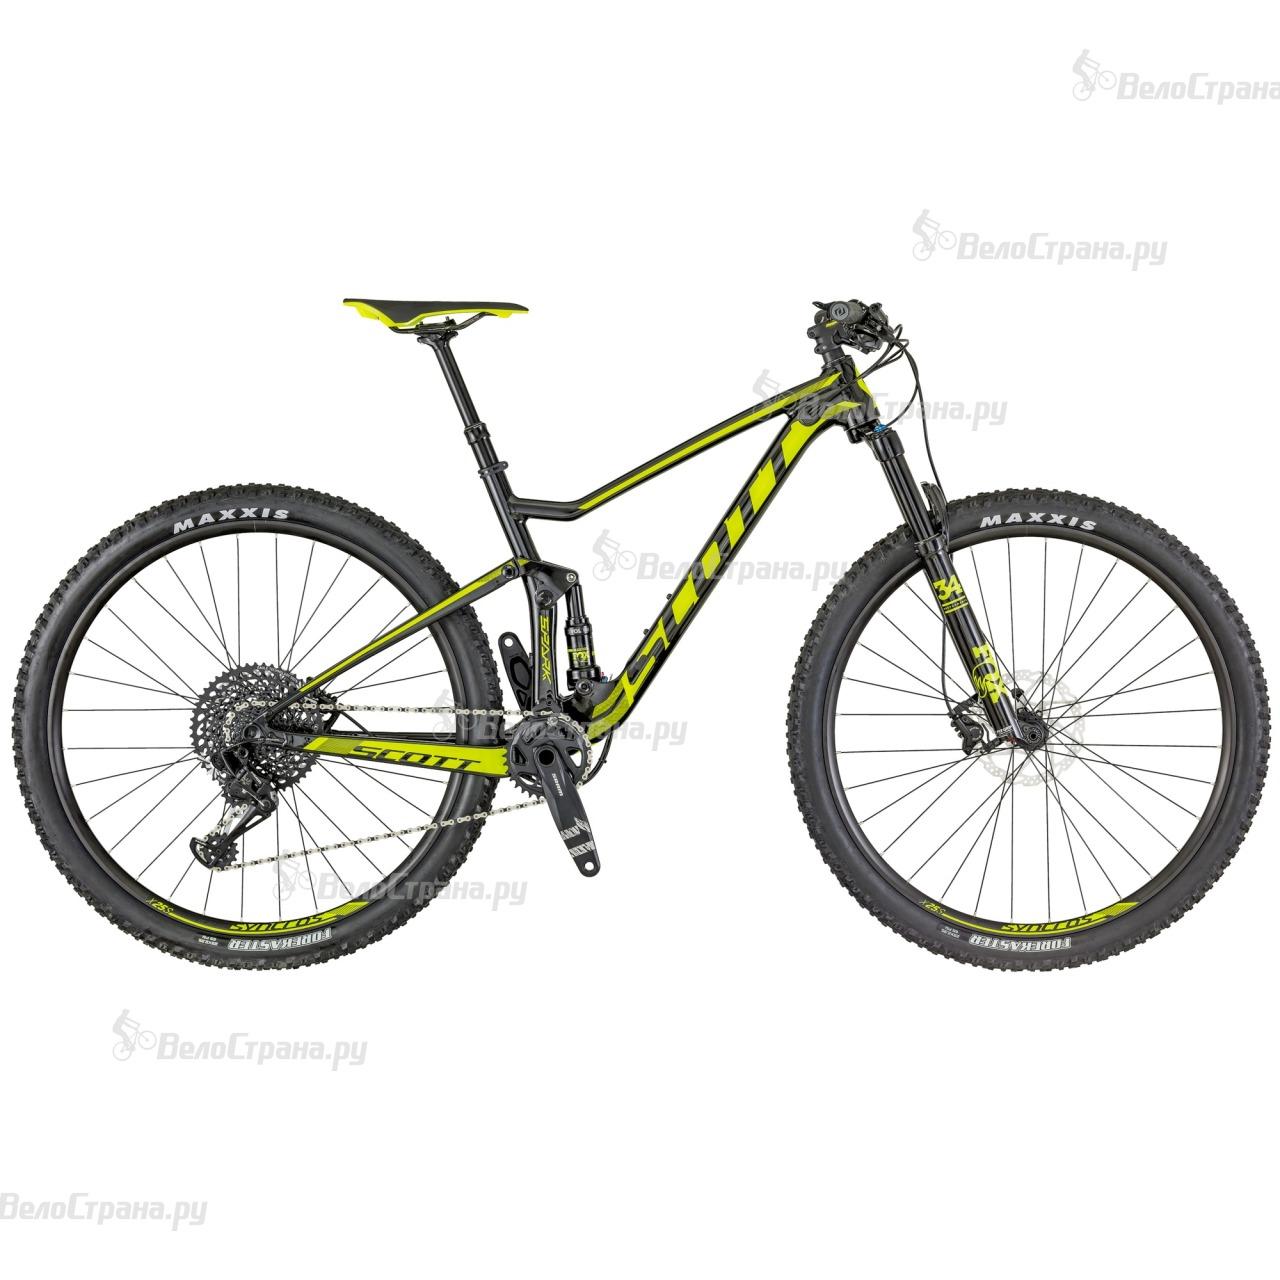 Велосипед Scott Spark 940 (2018) телефон wileyfox spark